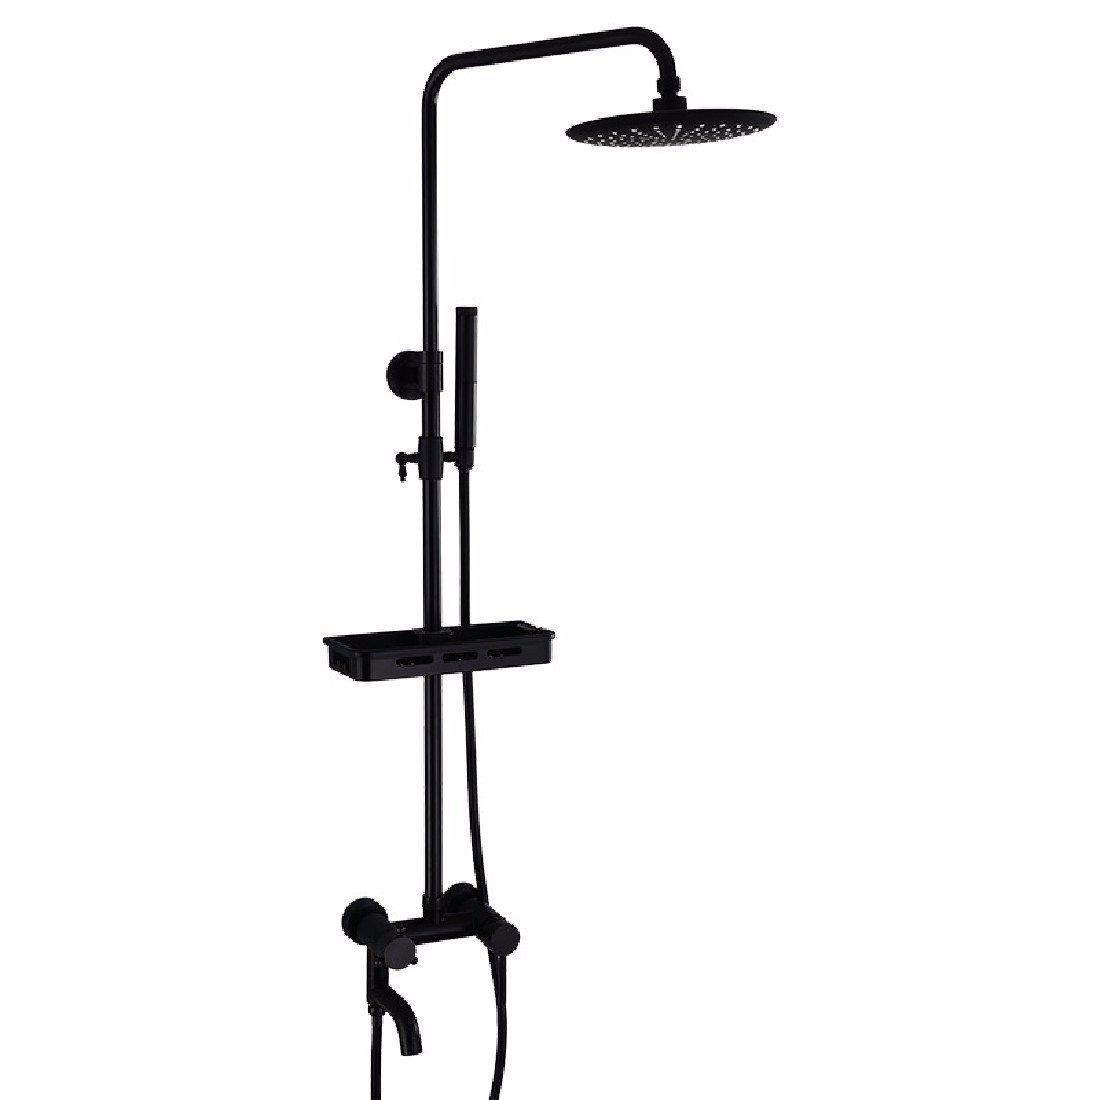 WAWZJ Bathroom Shower Set European Style Black Shower Faucet All Copper Hotel Americano Wall Mounted Shower.